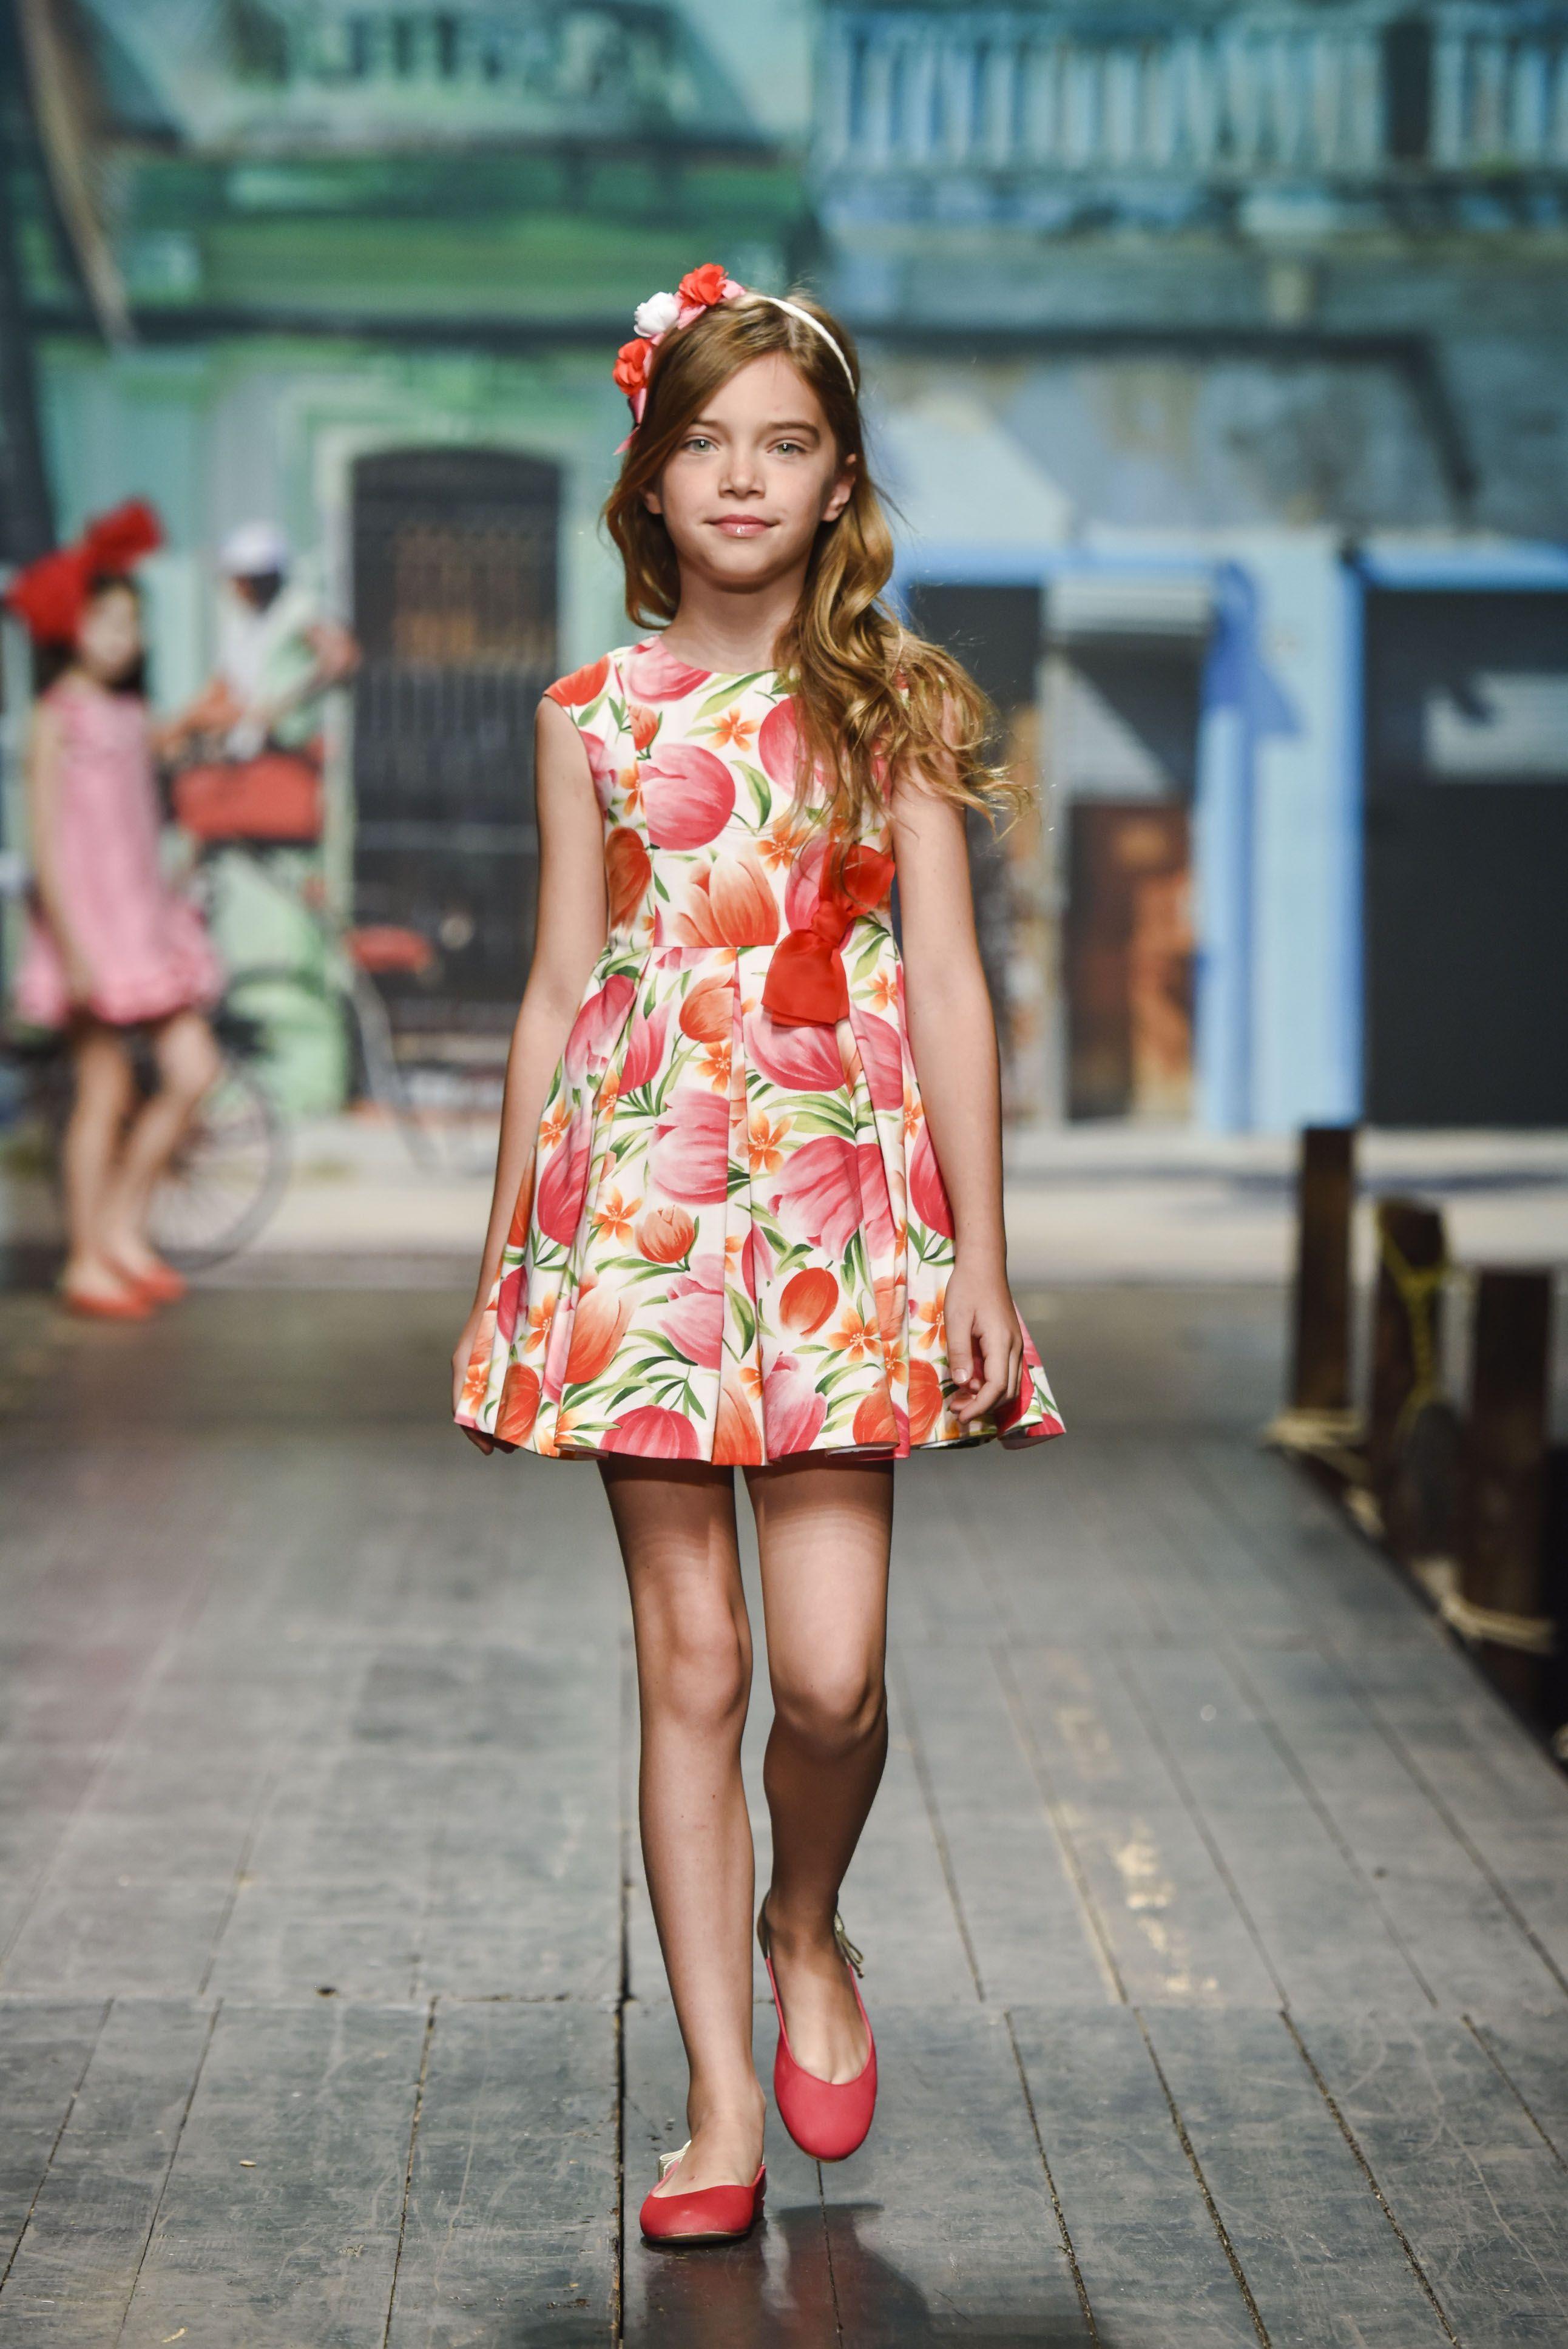 en casa rima Fe ciega  Pin en Ferias moda infantil